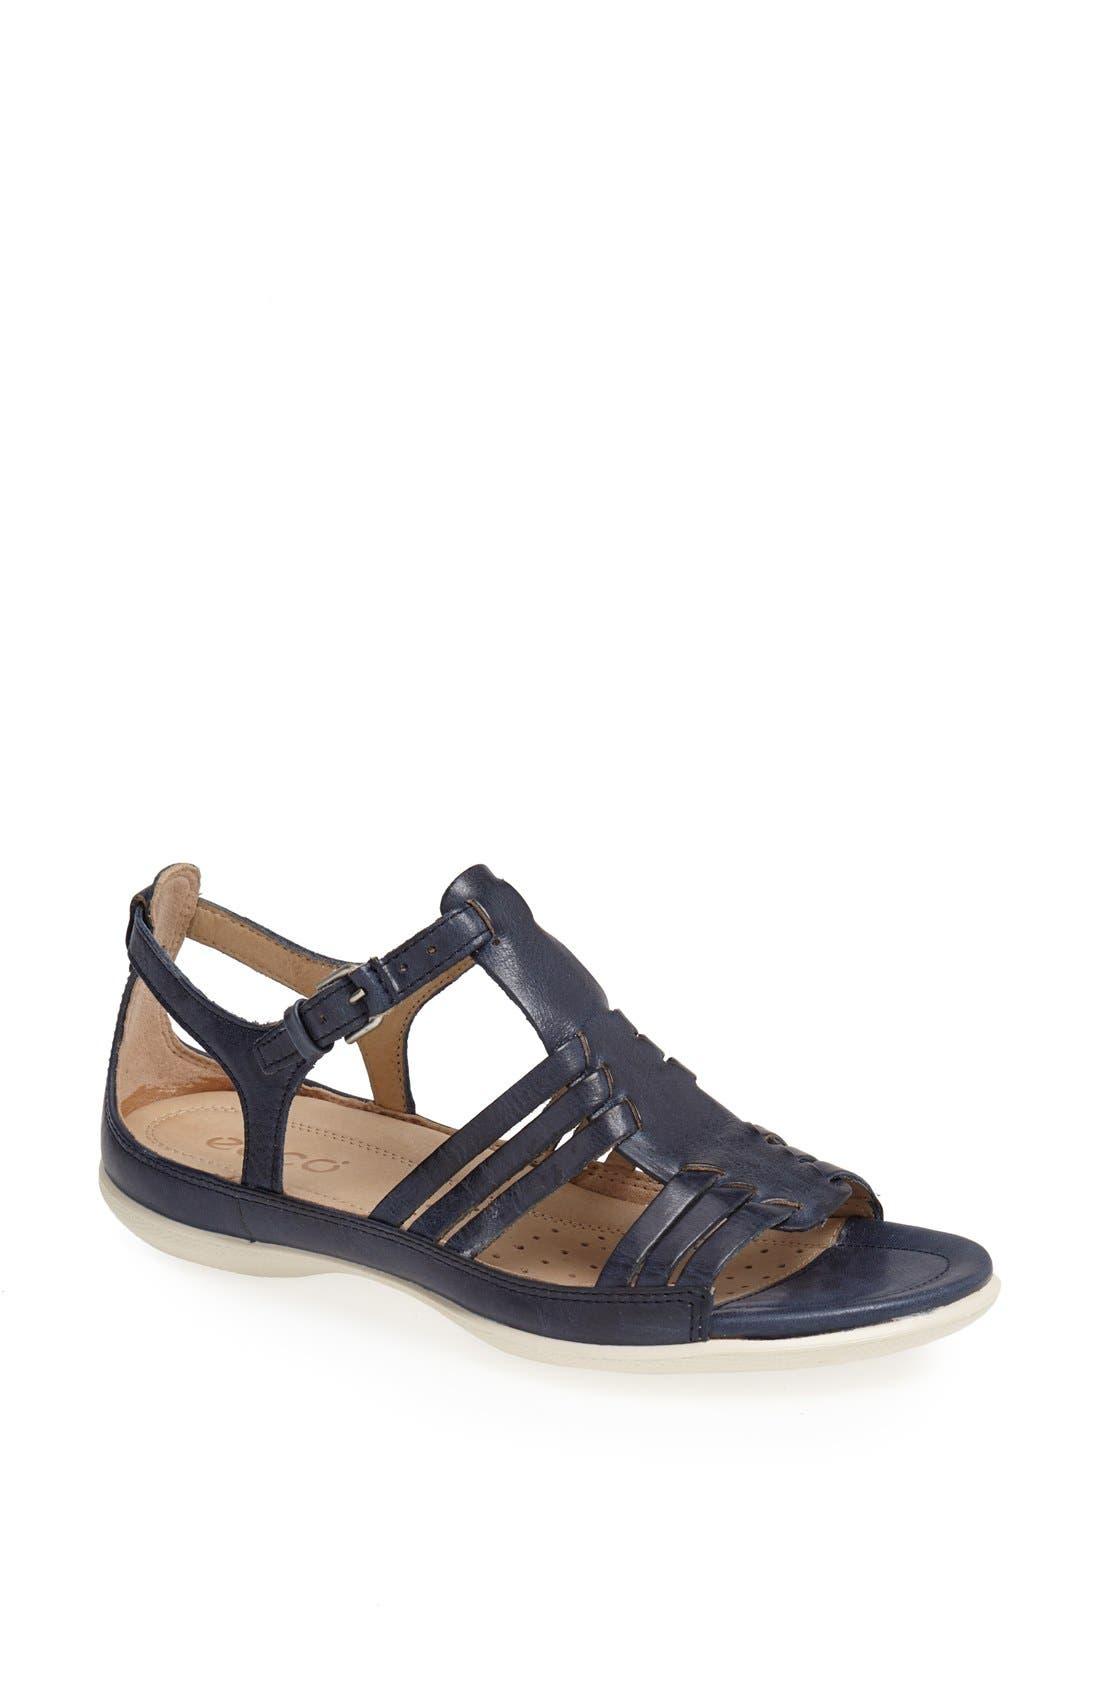 Alternate Image 1 Selected - ECCO 'Flash' Sandal